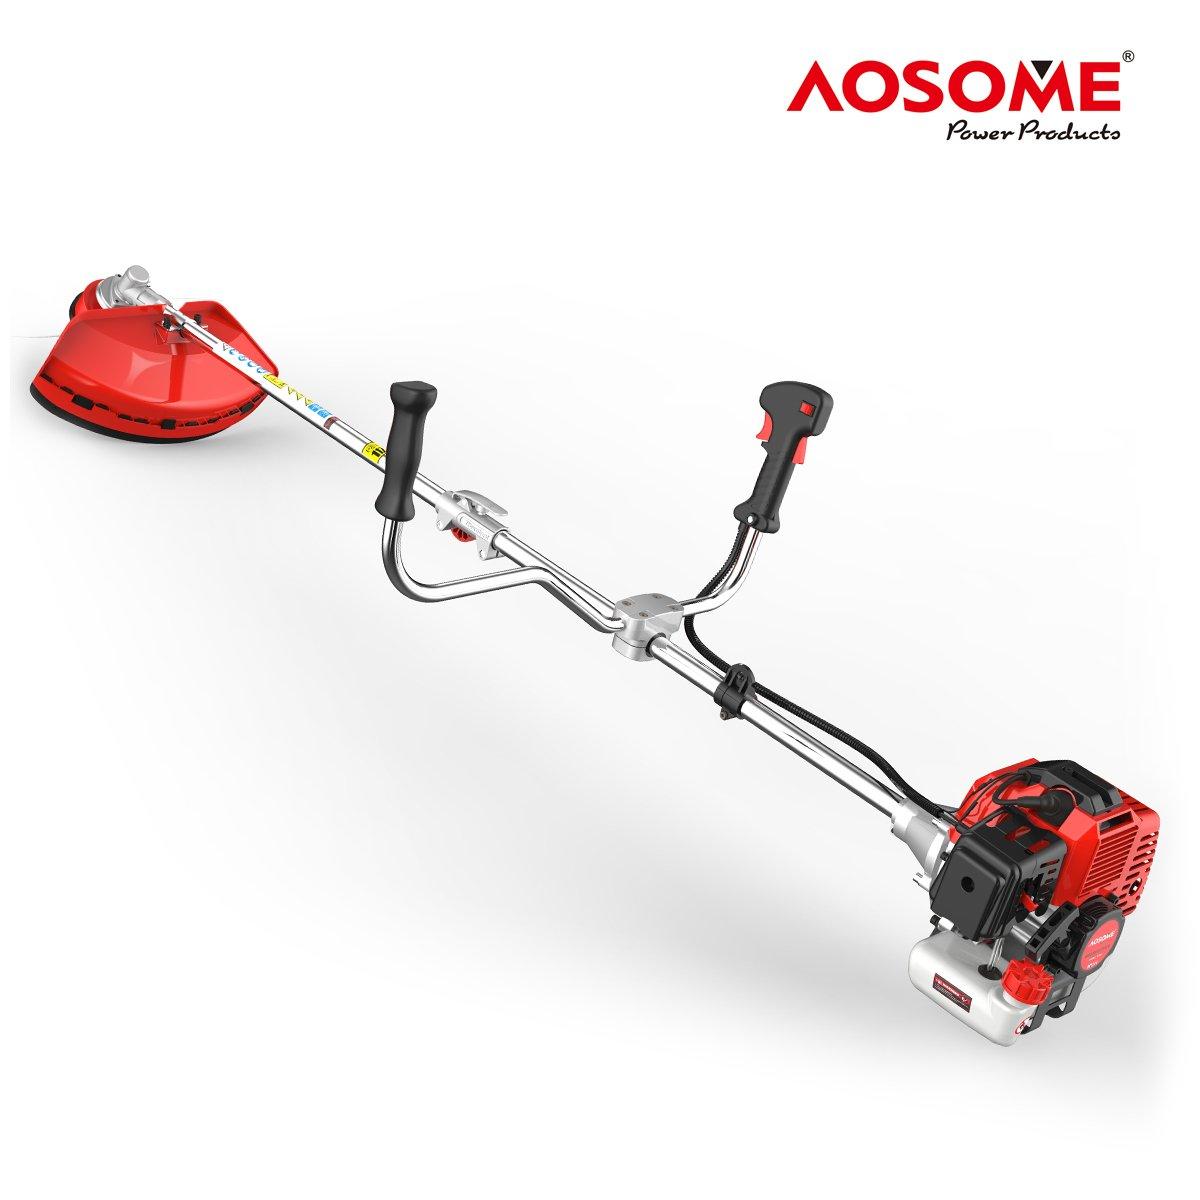 AOSOME Desbrozadora Gasolina 52cc, 2 Tiempos, 2.2kw, 3.0HP: Amazon ...